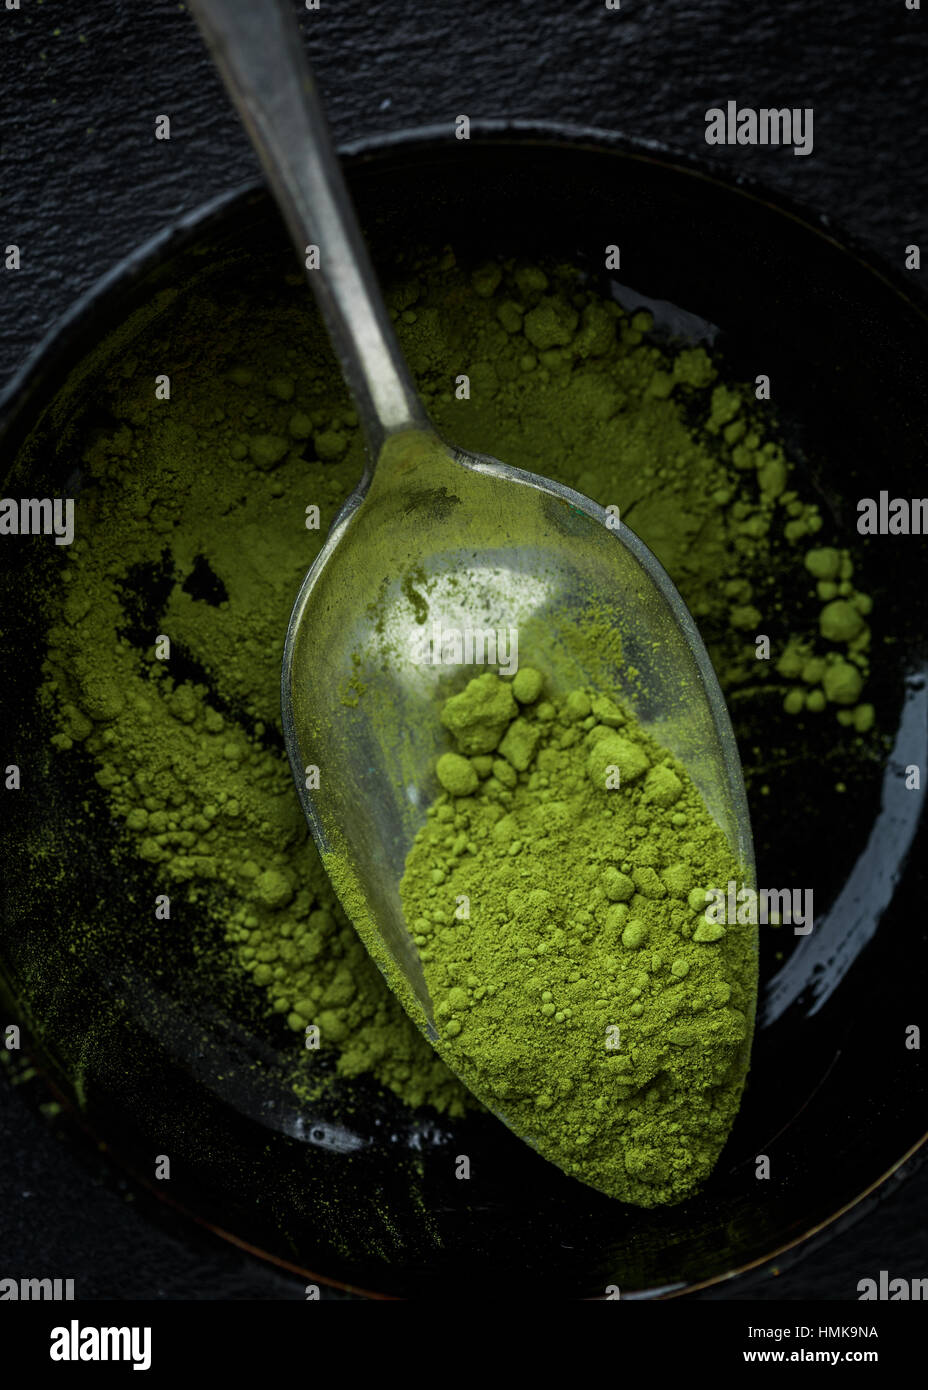 Una taza de té matcha en polvo en una cuchara Imagen De Stock